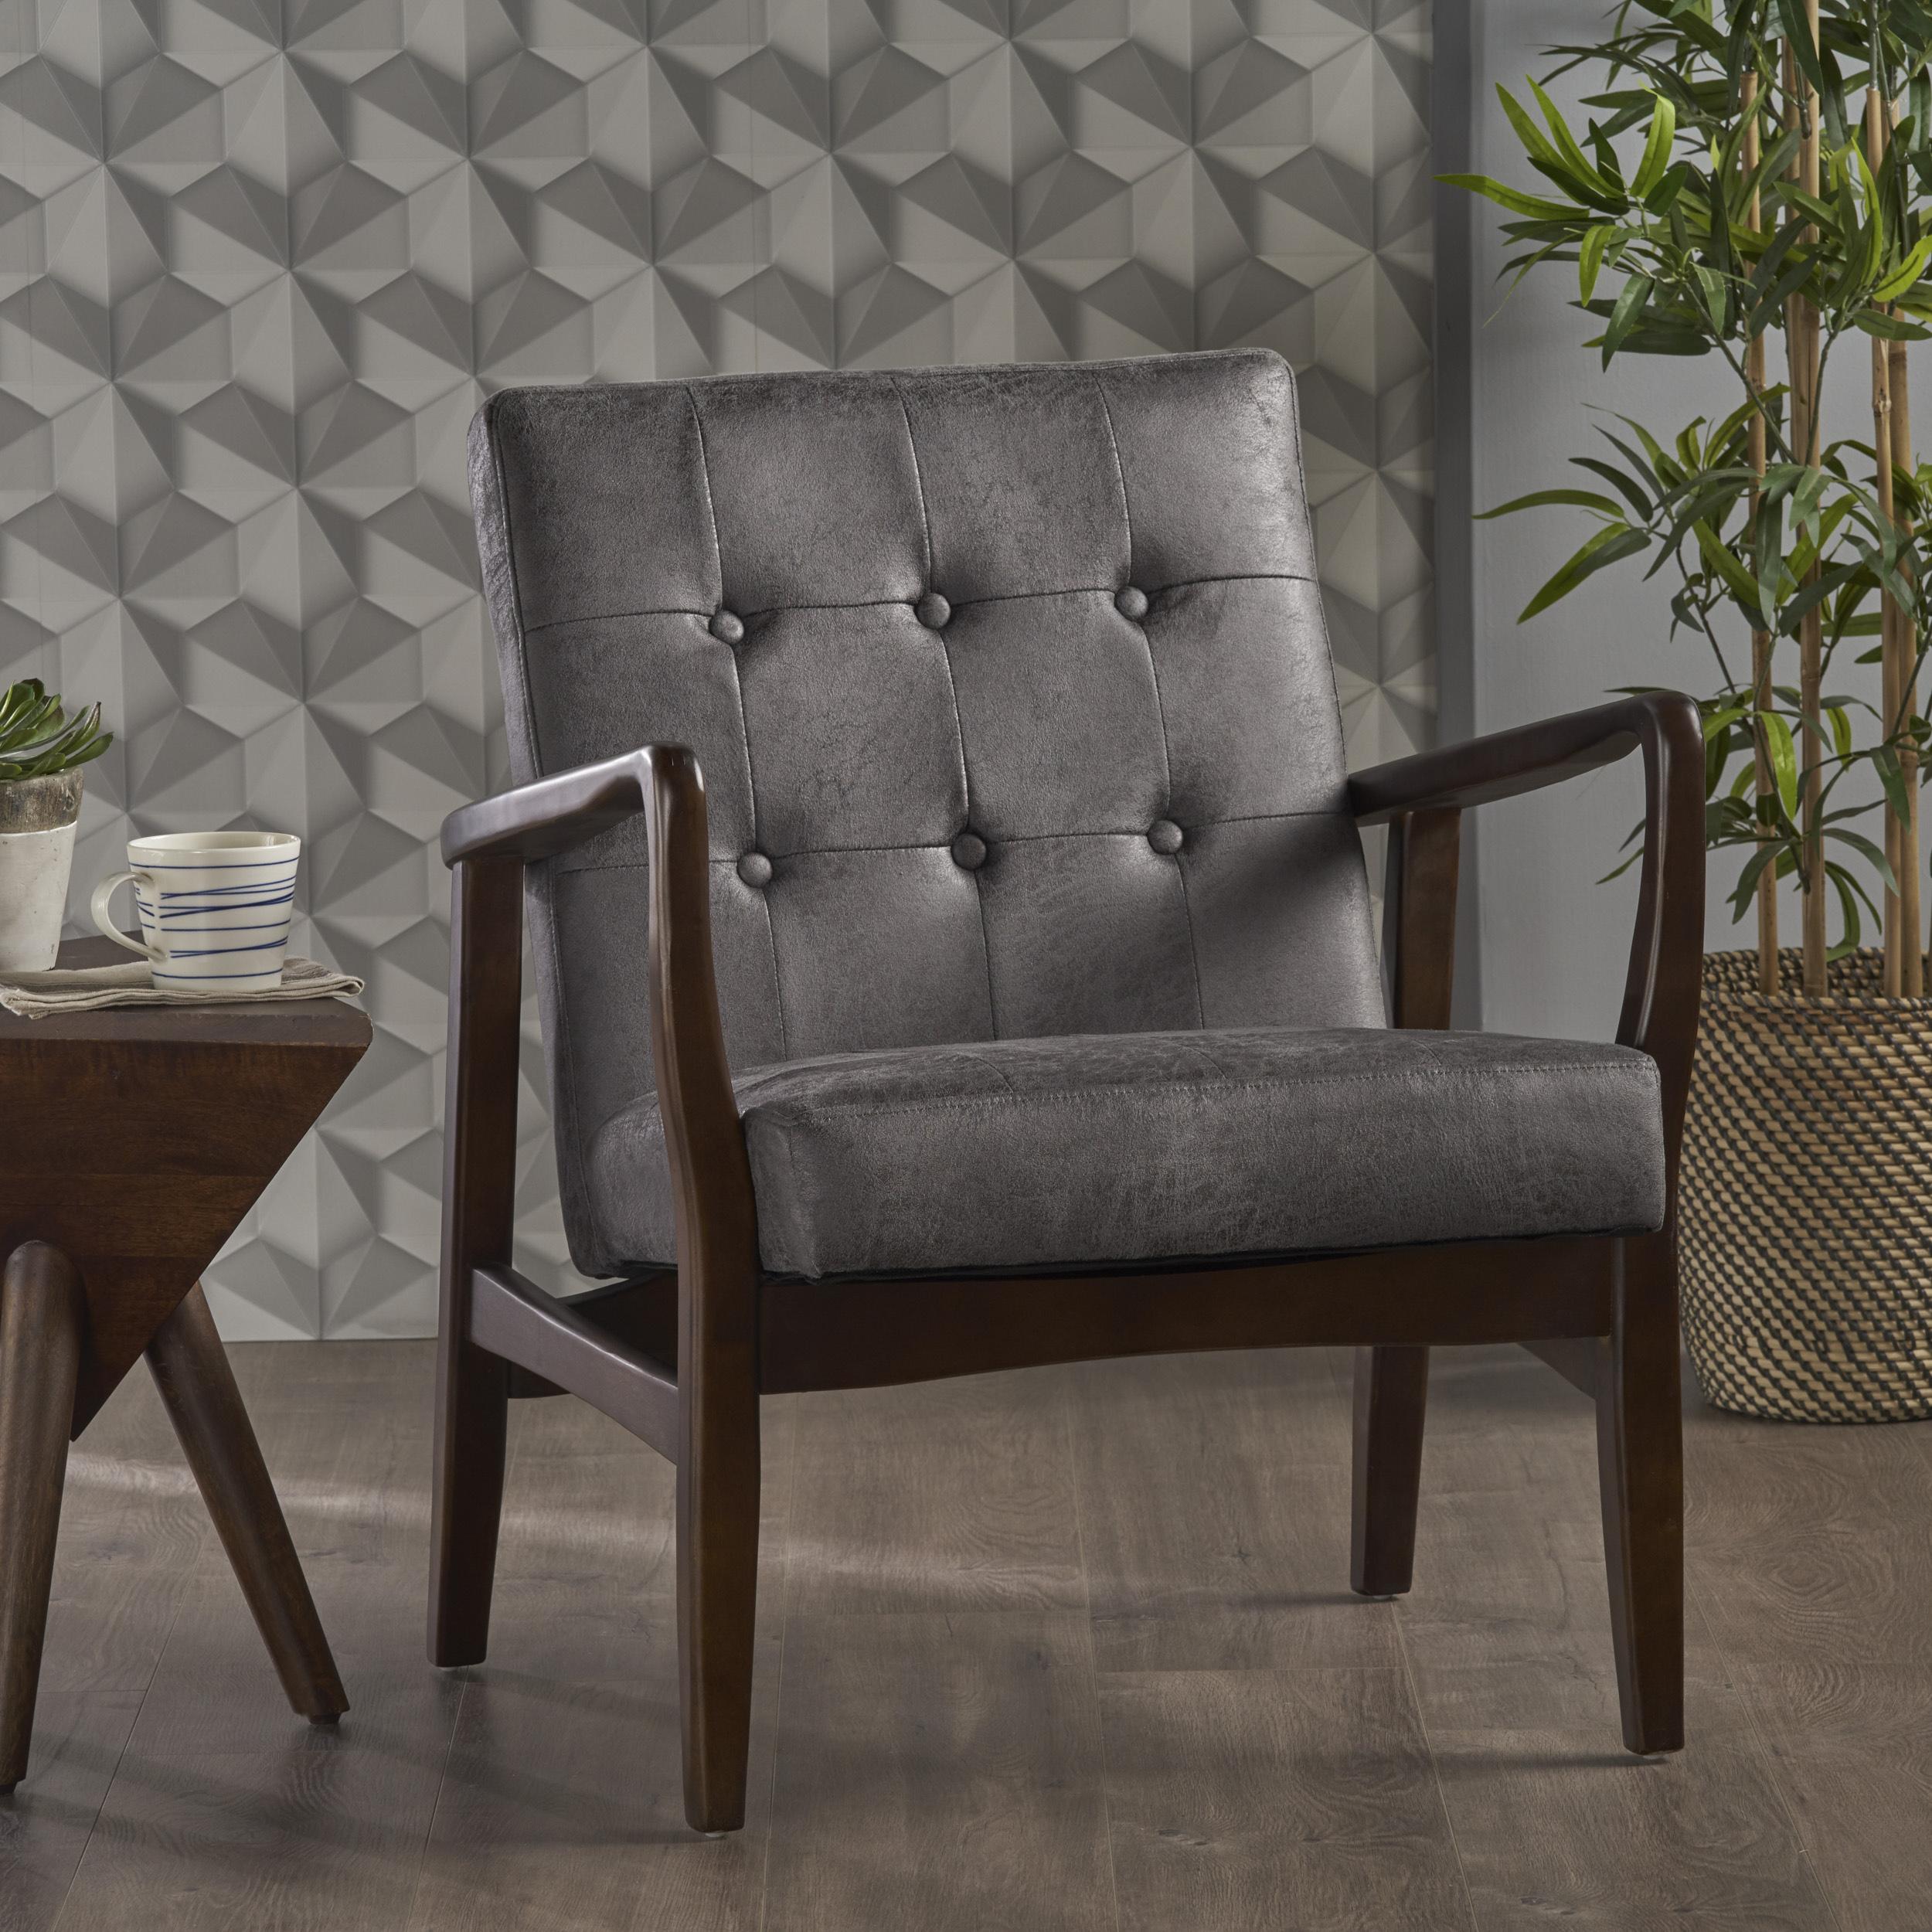 Noble House Everett Mid Century Modern Microfiber Club Chair, Slate, Dark Espresso